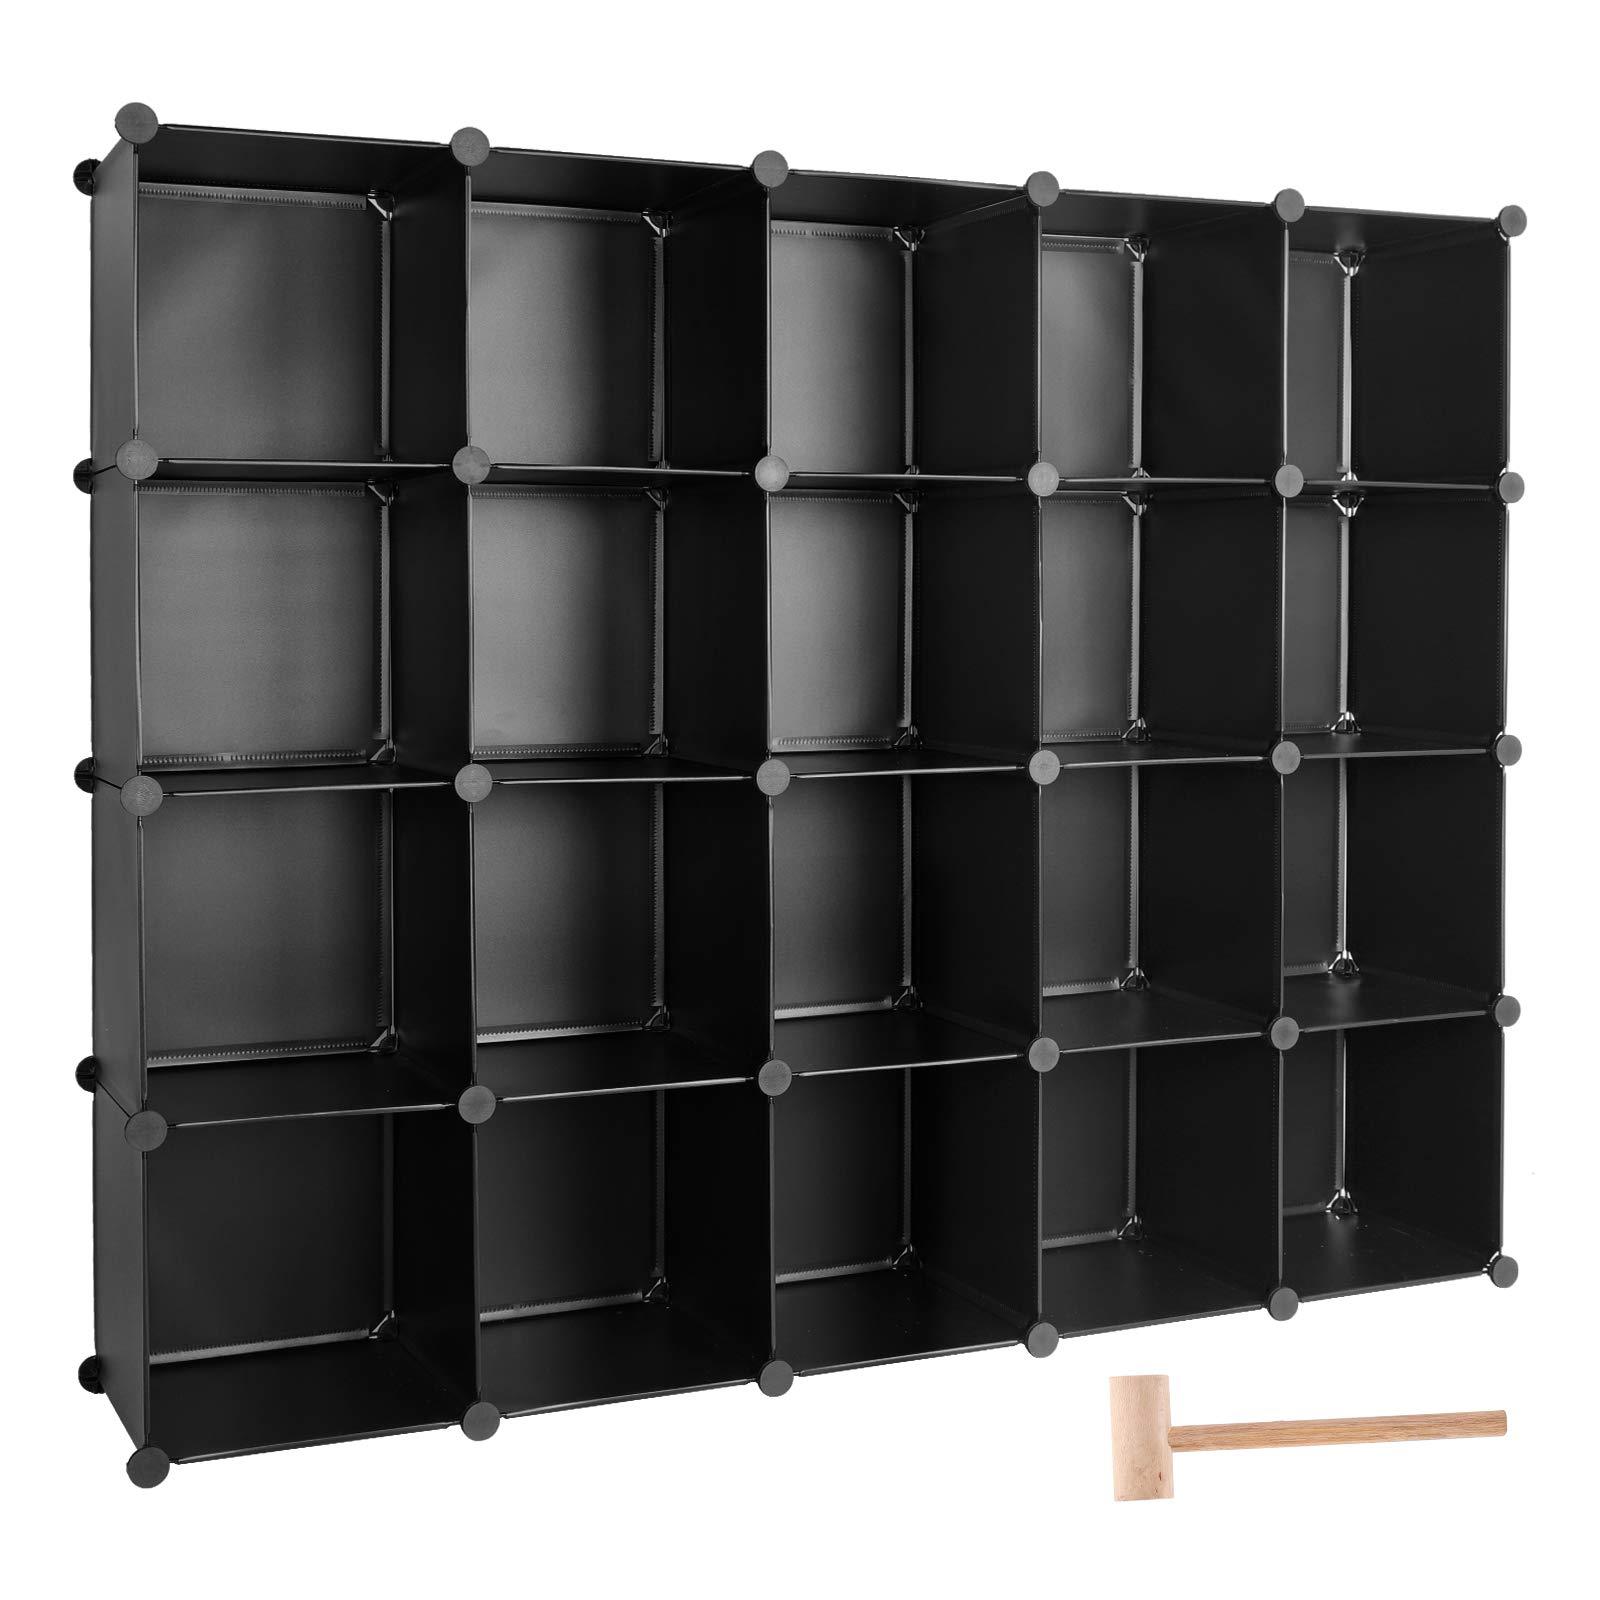 TUMUCUTE Cube Storage Organizer, 20-Cube DIY Plastic Closet Cabinet Modular Bookcase, Storage Shelves for Bedroom Living Room, Office, Black